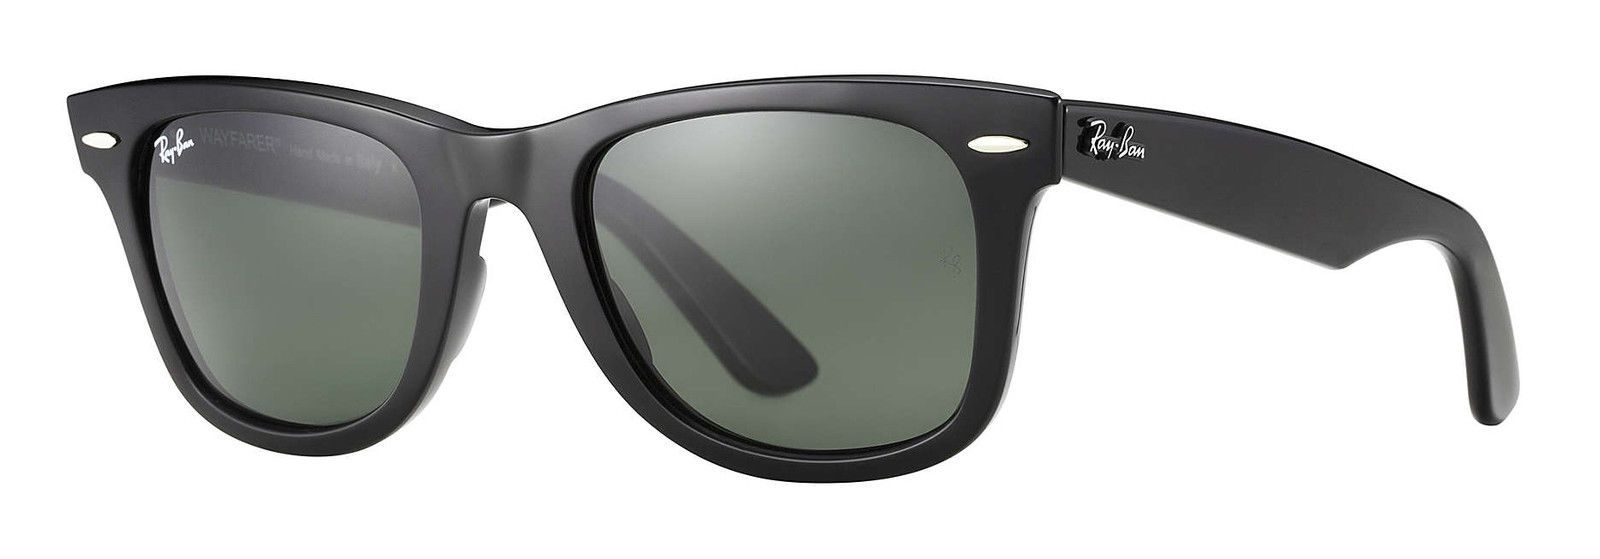 31fc2dba395 Ray Ban RB 2140 Original Wayfarer 901 Black Frame  Green Classic G-15 Glass  Lens